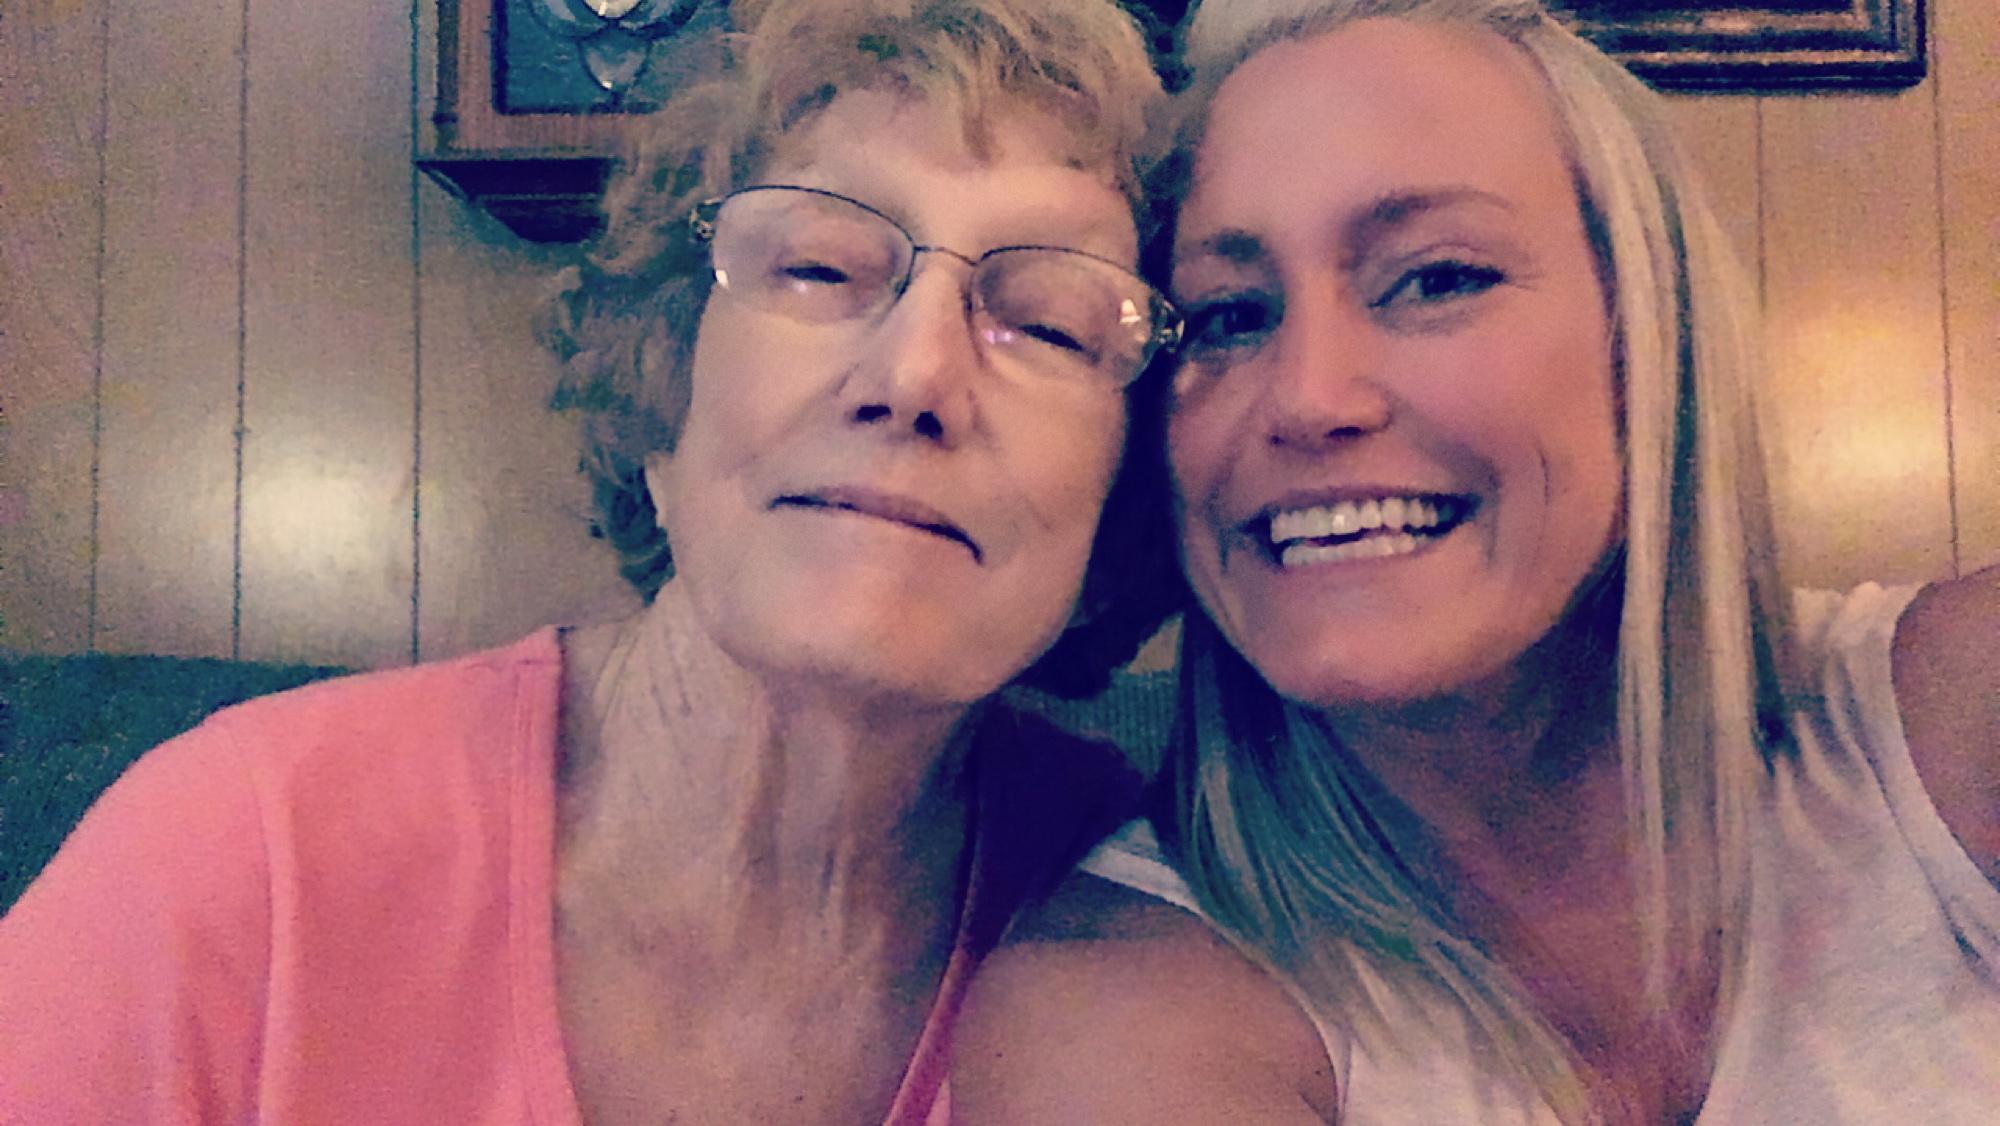 My Mama and me!